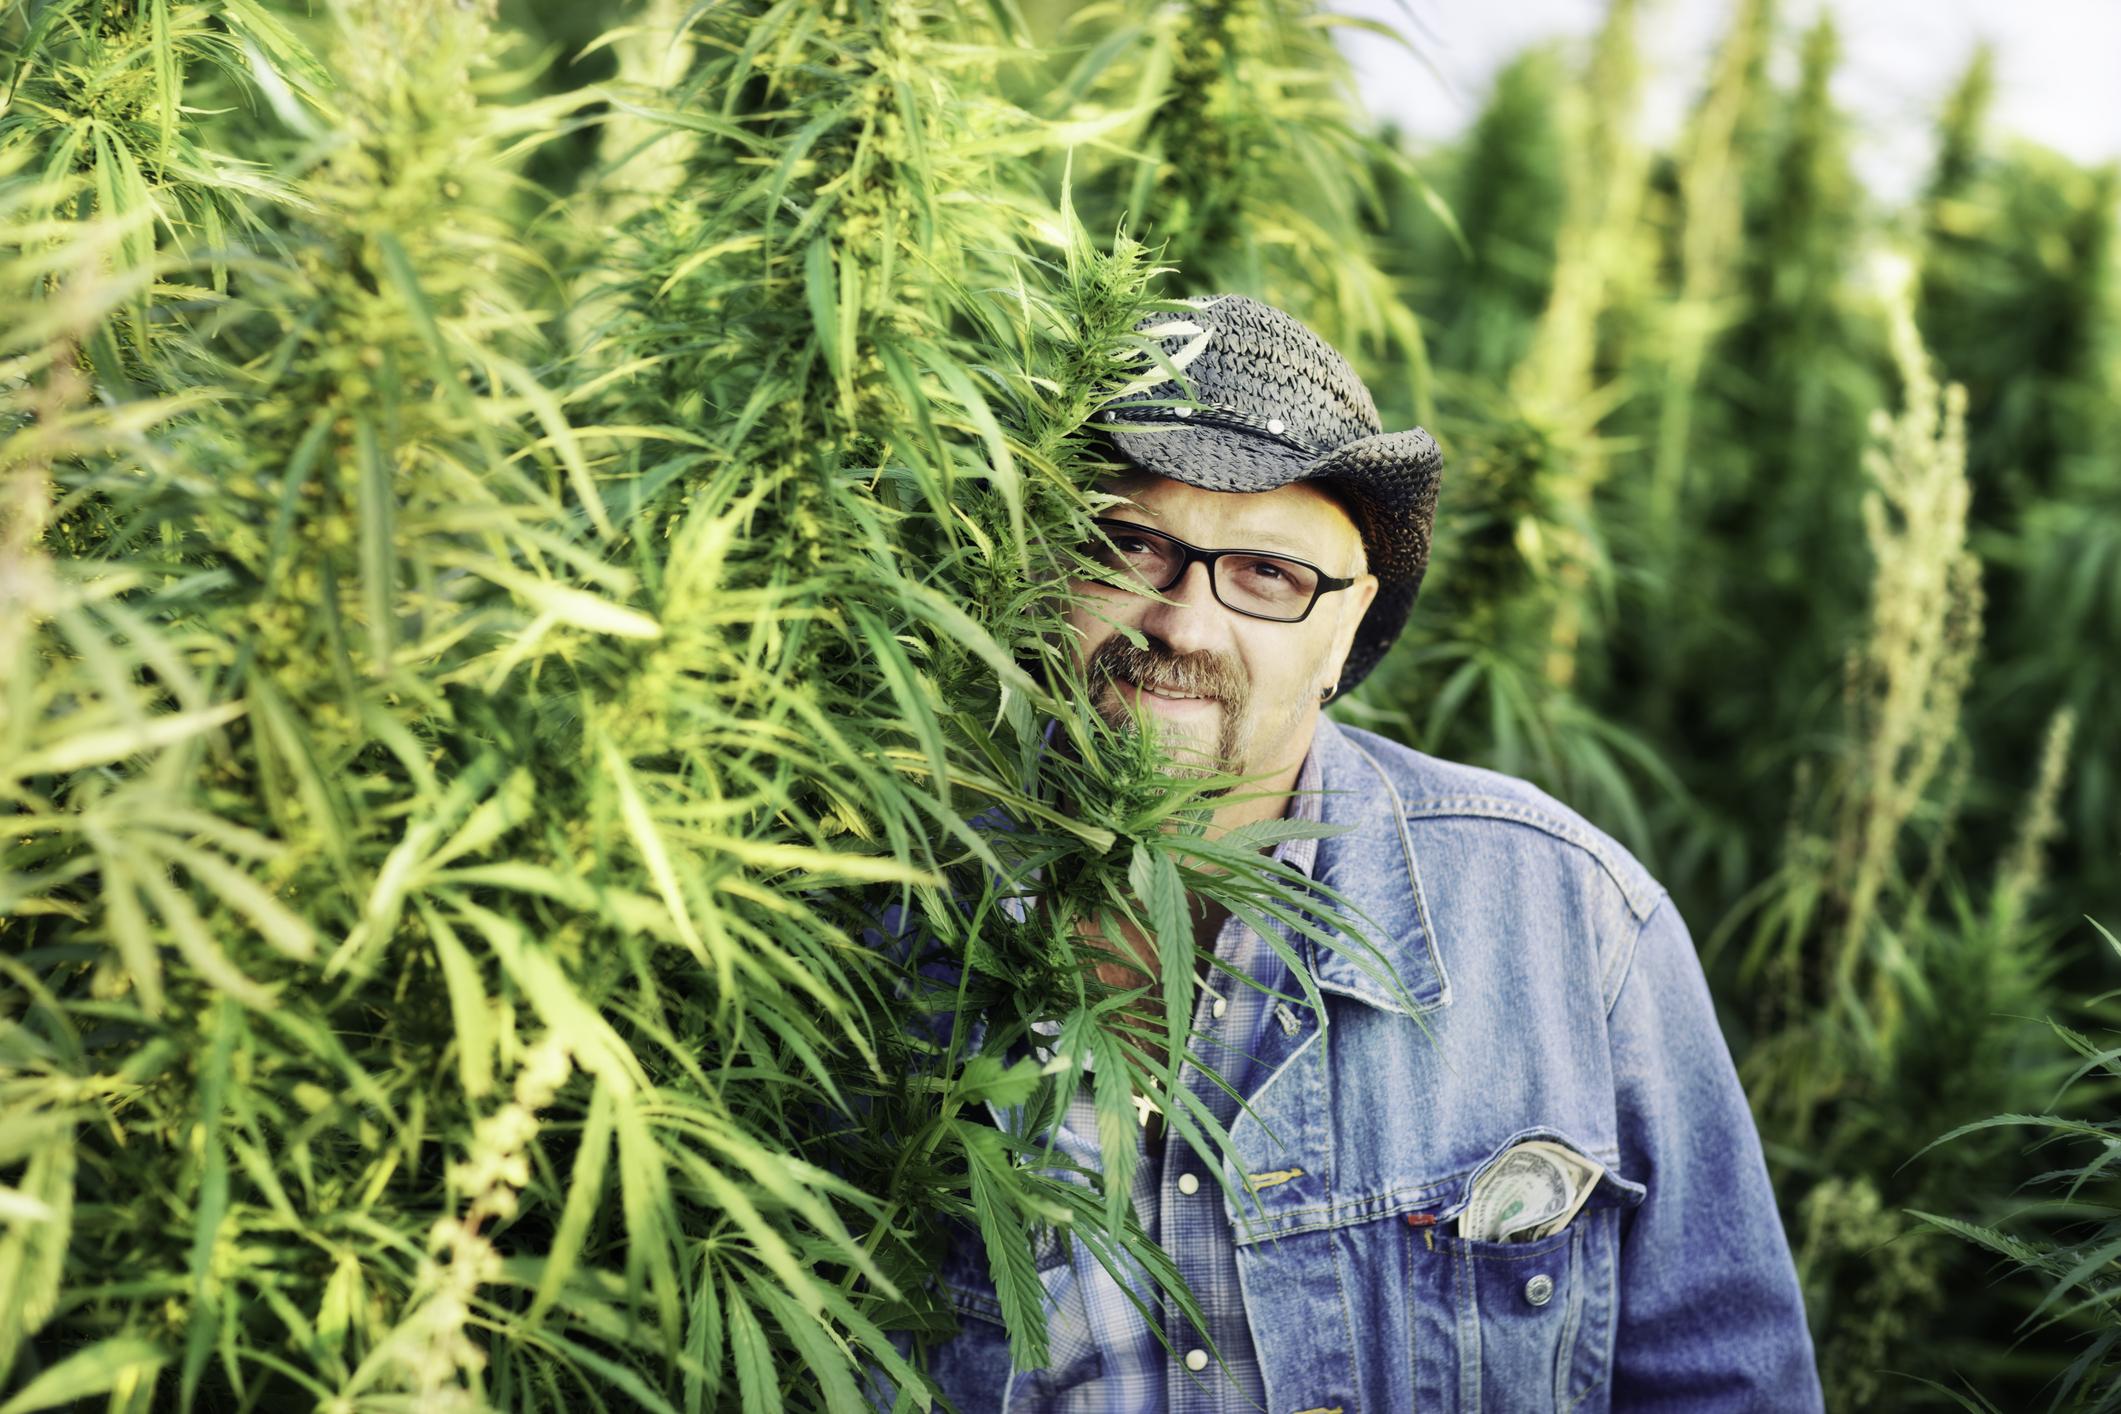 A man in a denim jacket standing next to hemp plants